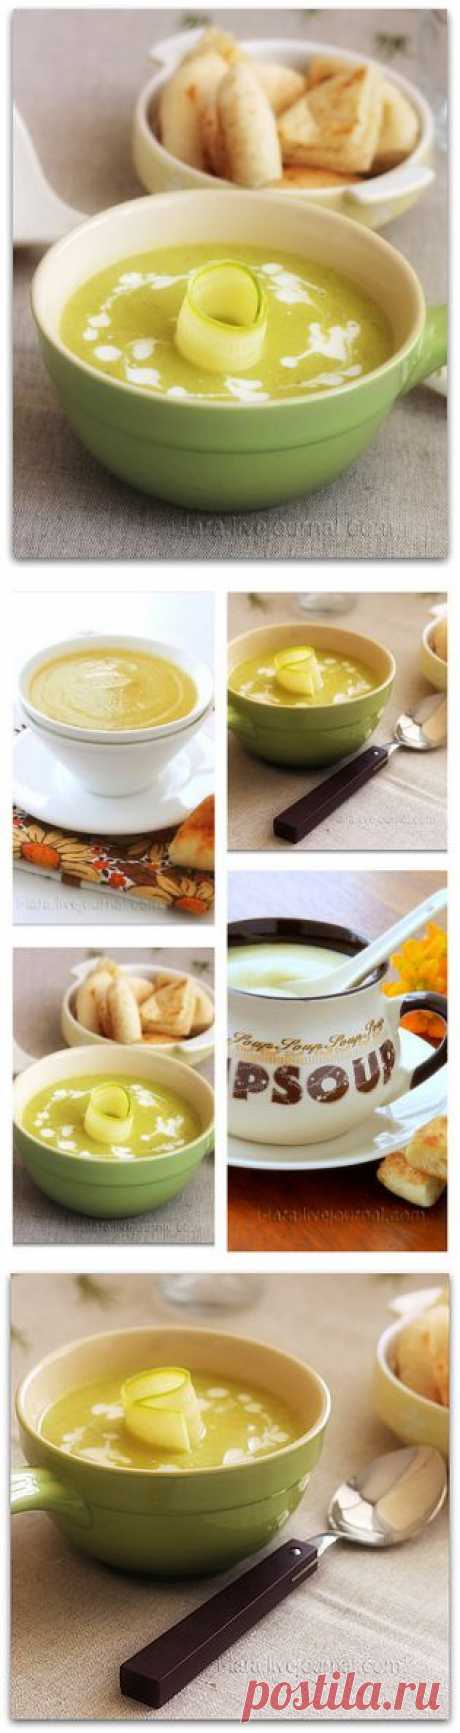 Крем-суп из кабачков | Четыре вкуса